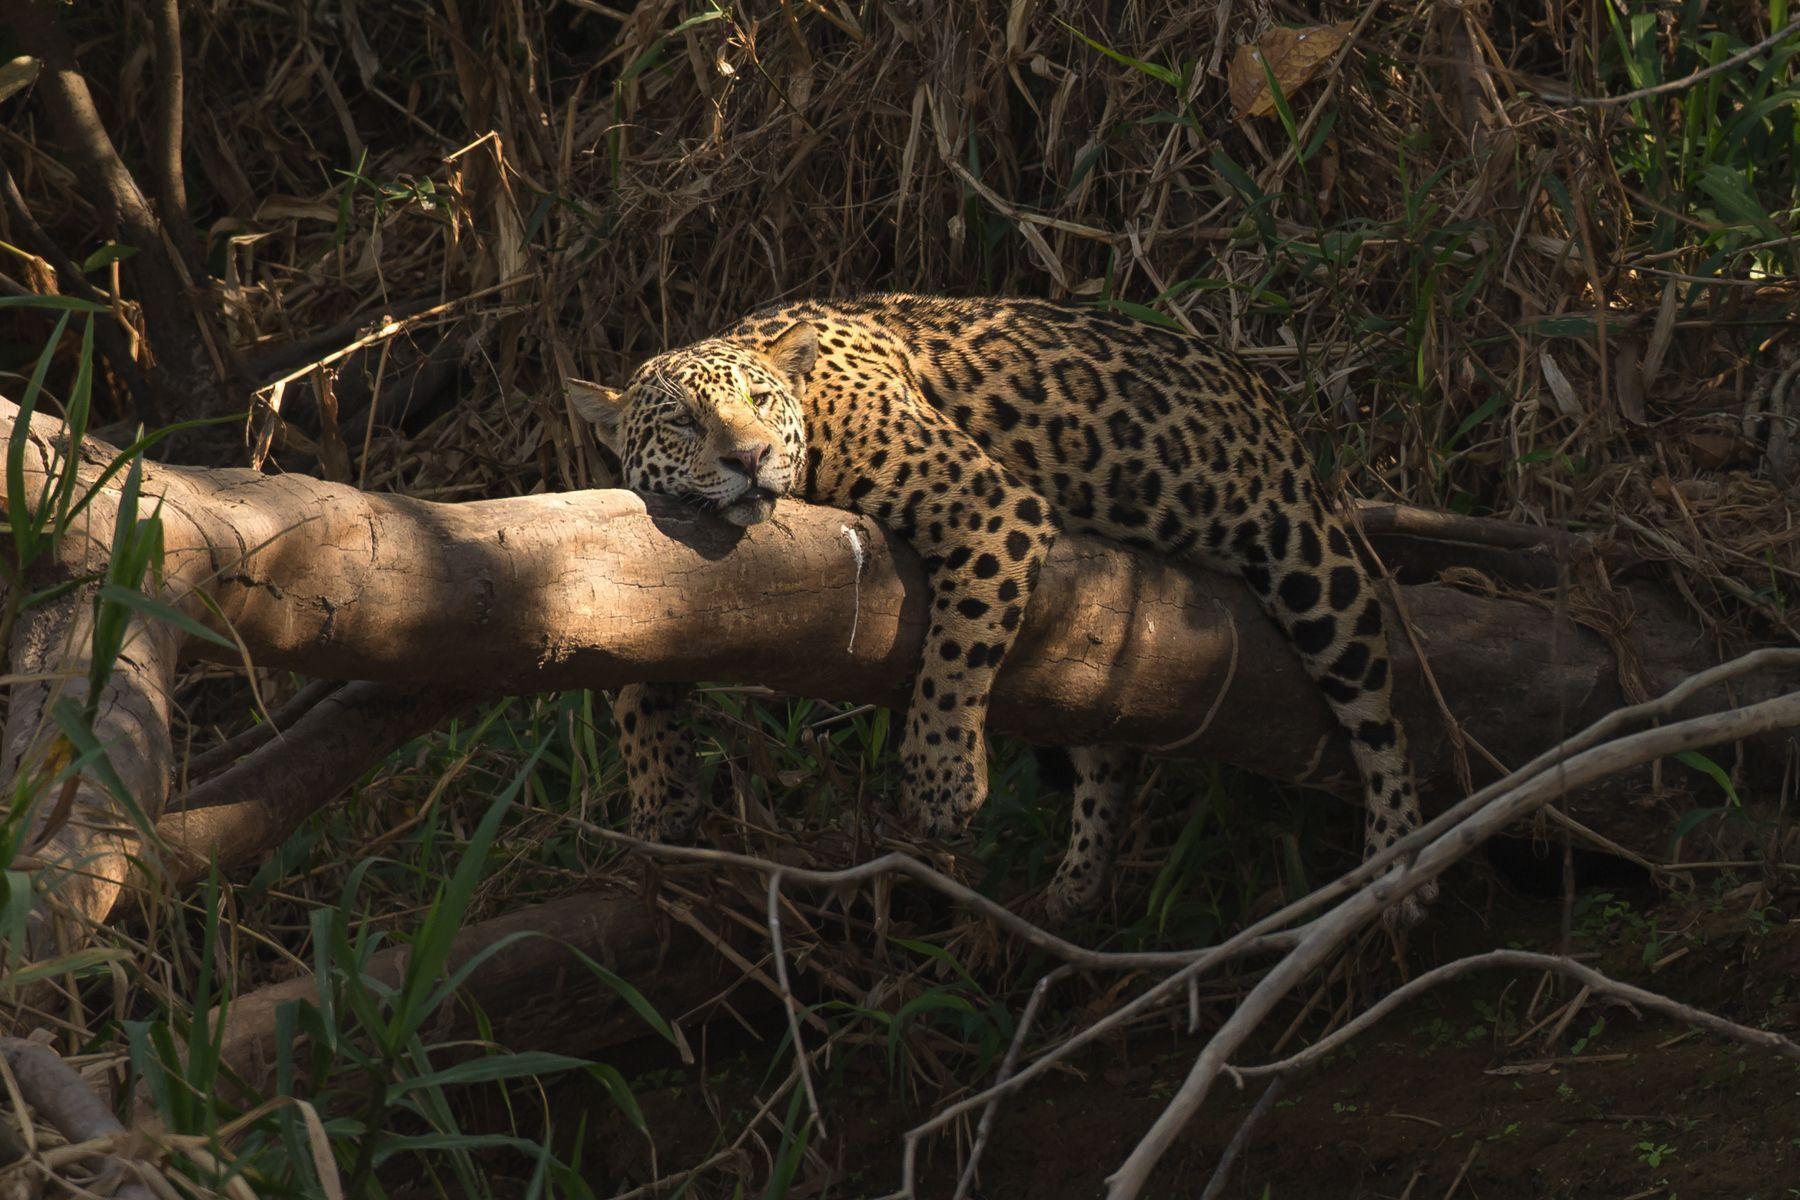 Rays of sunshine illuminate a Jaguar sleeping on a log